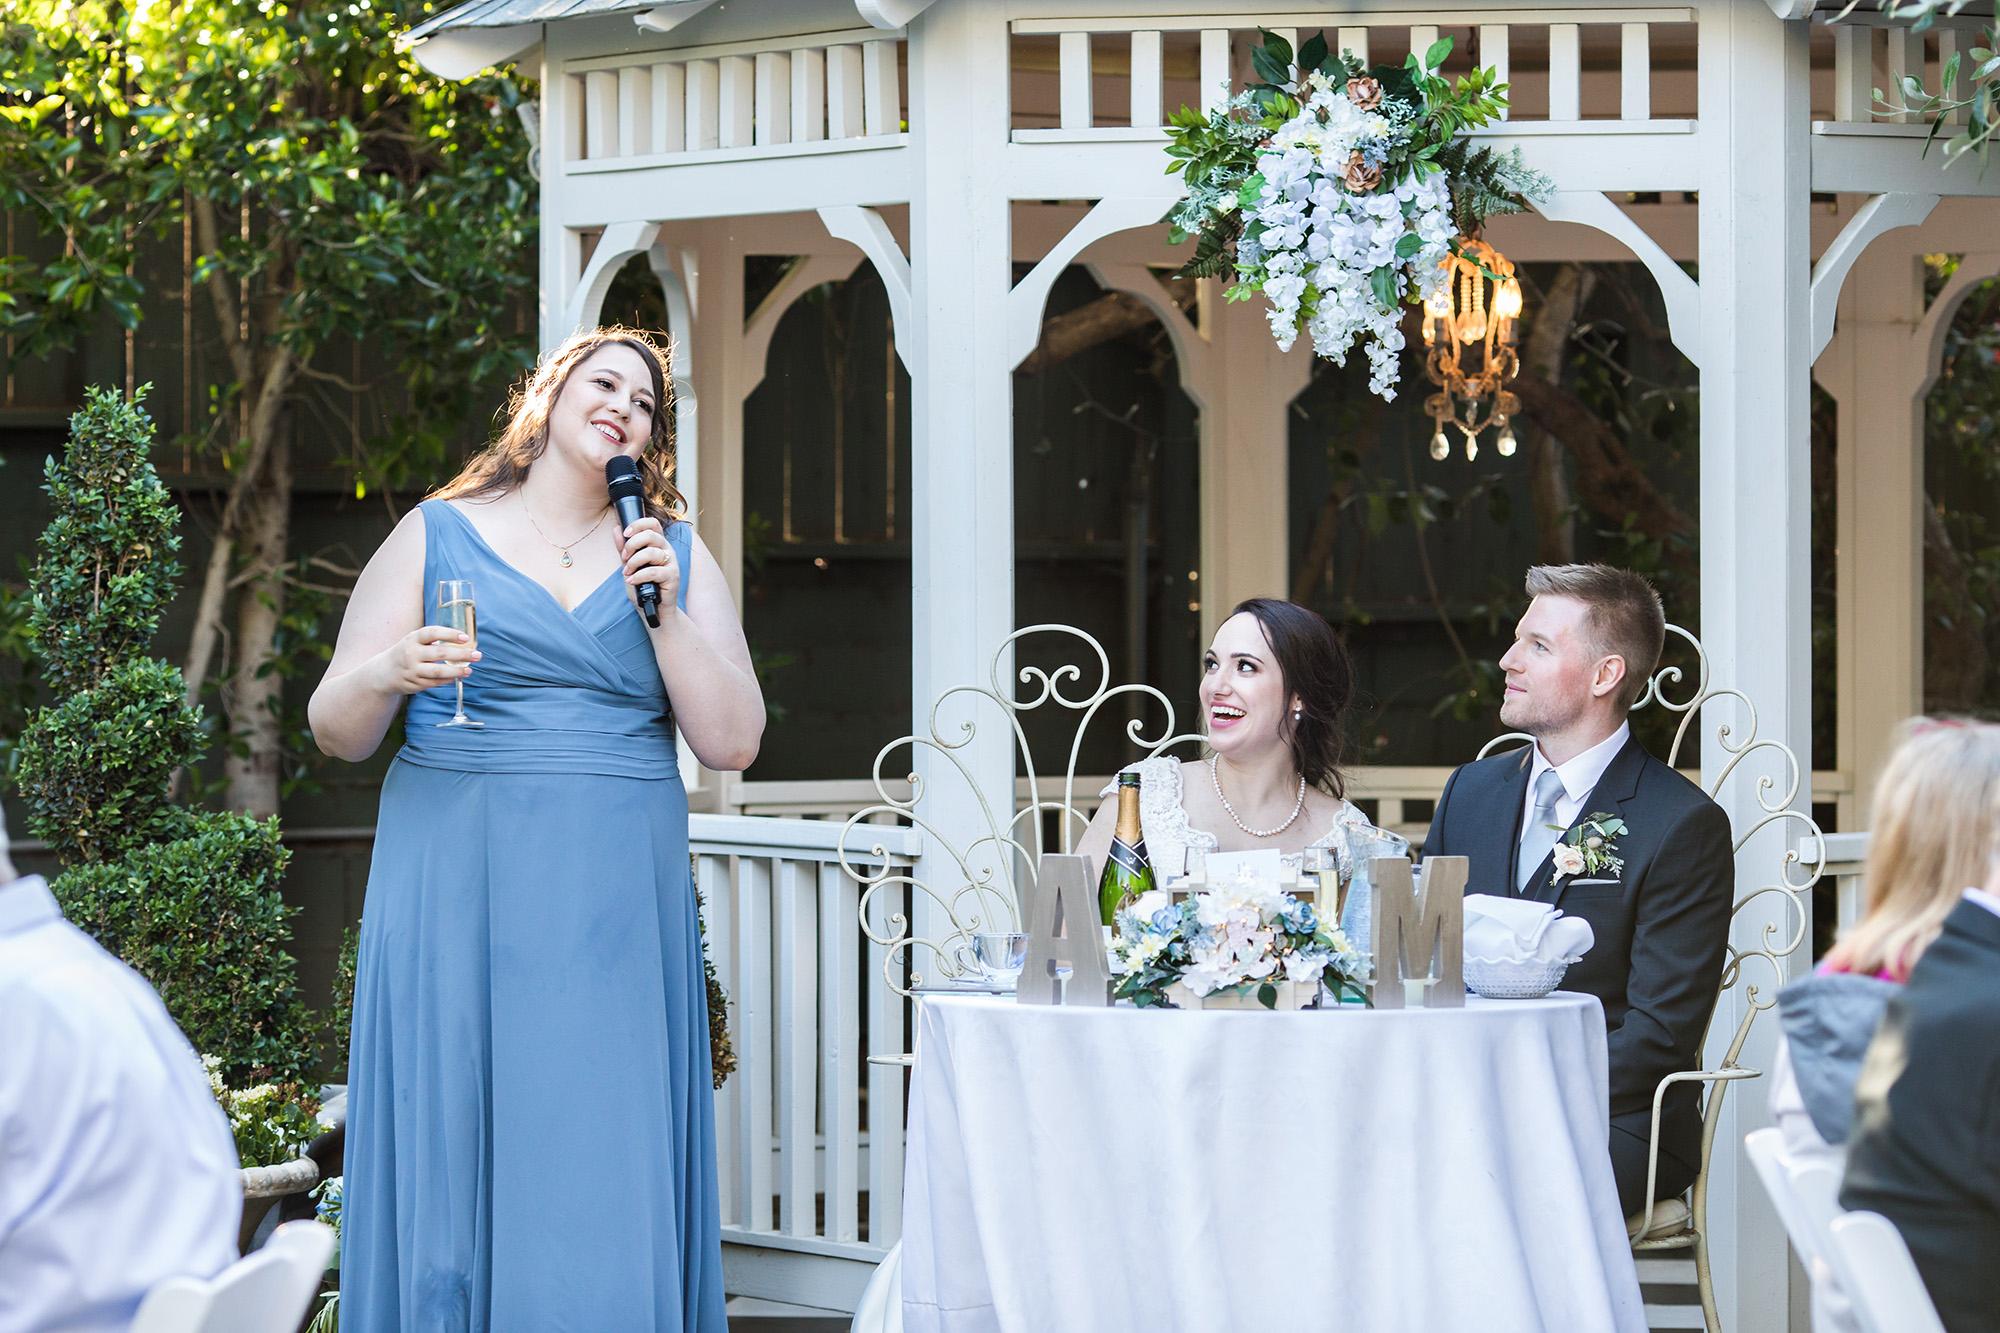 associate-photographer-christmas-house-wedding-carrie-vines-0052.jpg